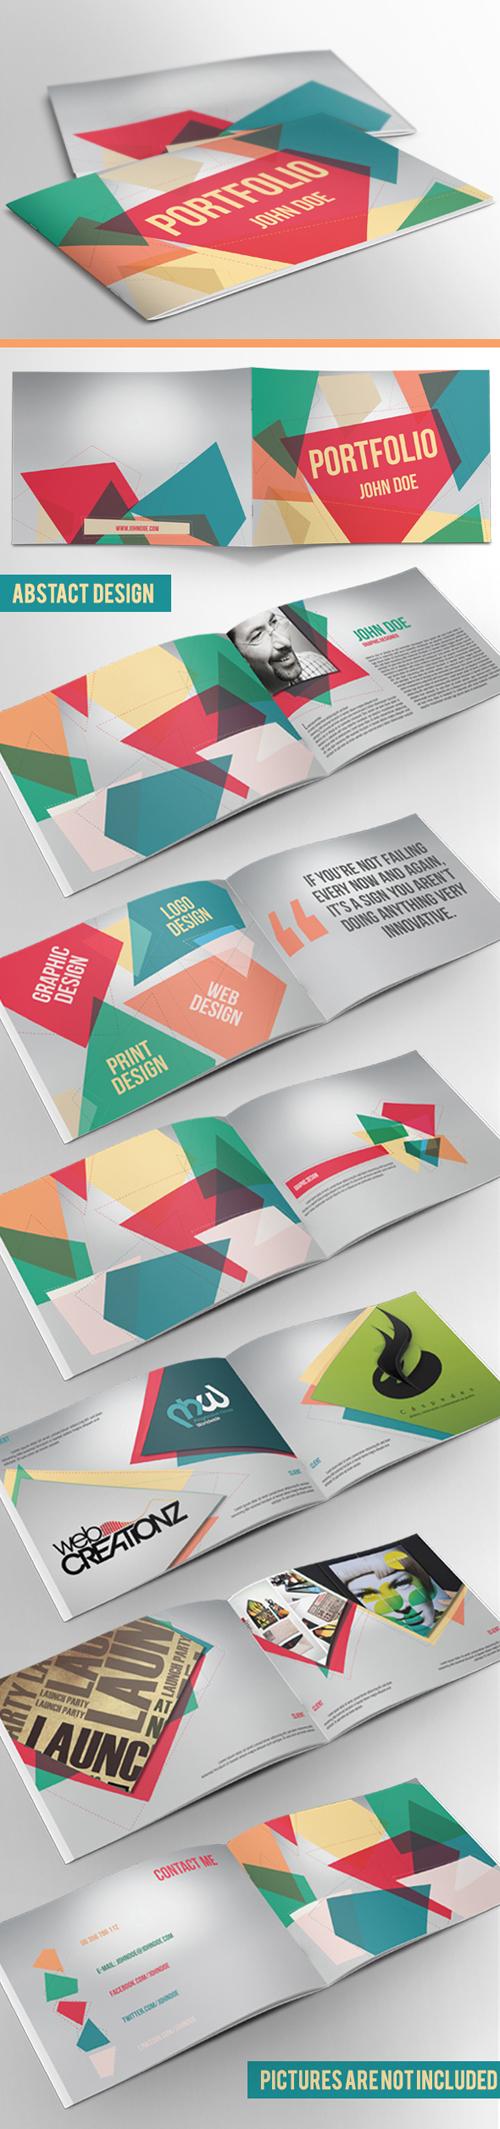 Business Portfolio Brochure Template